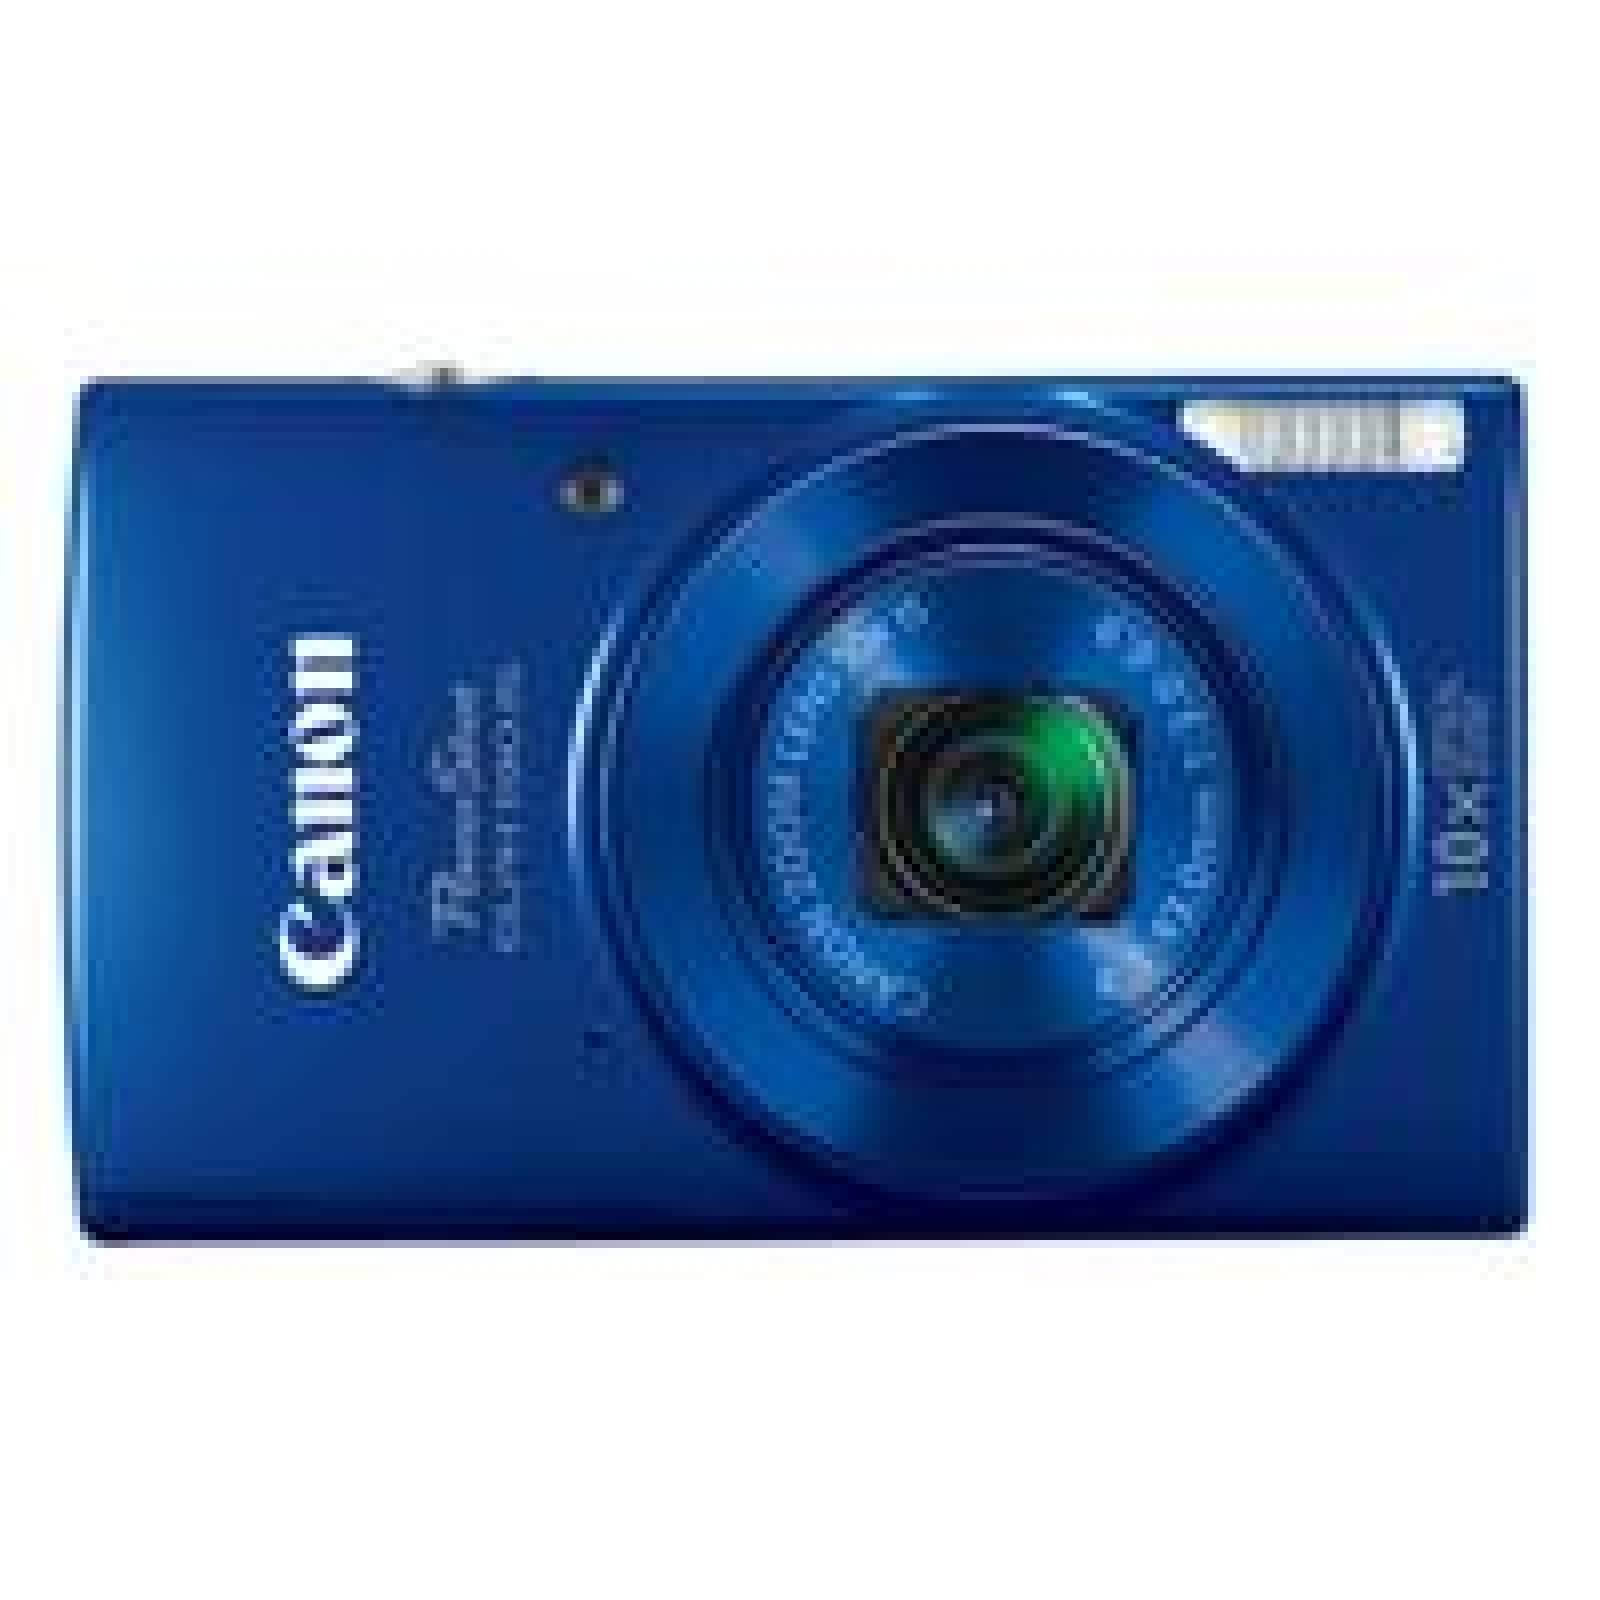 CAMARA CANON POWERSHOT ELPH 190 IS. 20MP 10X ZOOM LCD 2.7 WIFI NFC ESTABILIZAOR AZUL